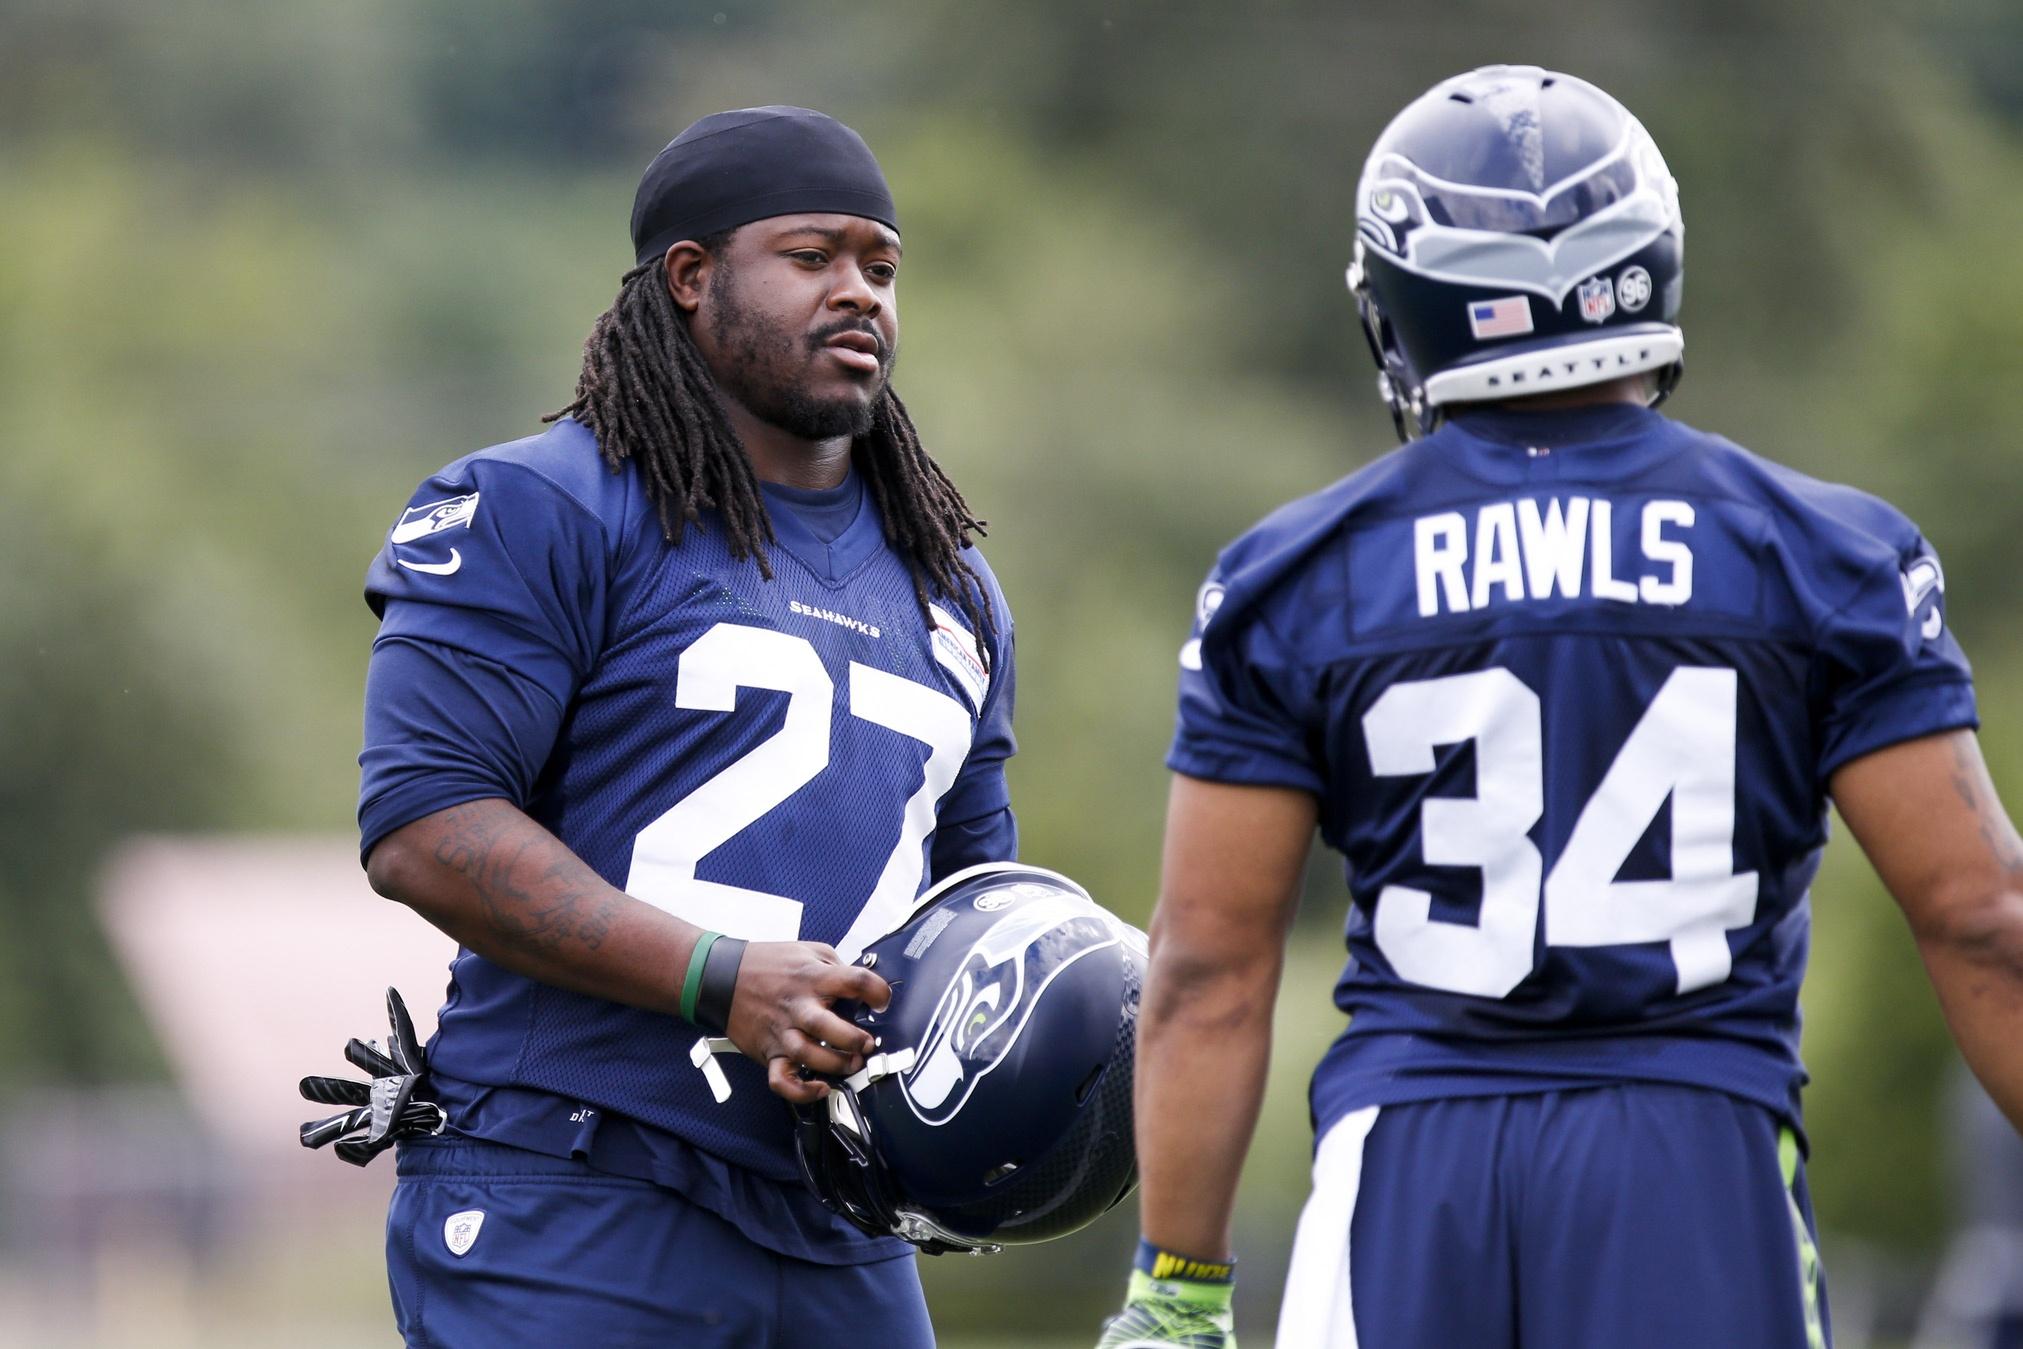 Eddie Lacy Seattle Seahawks practice NFL training camp battles